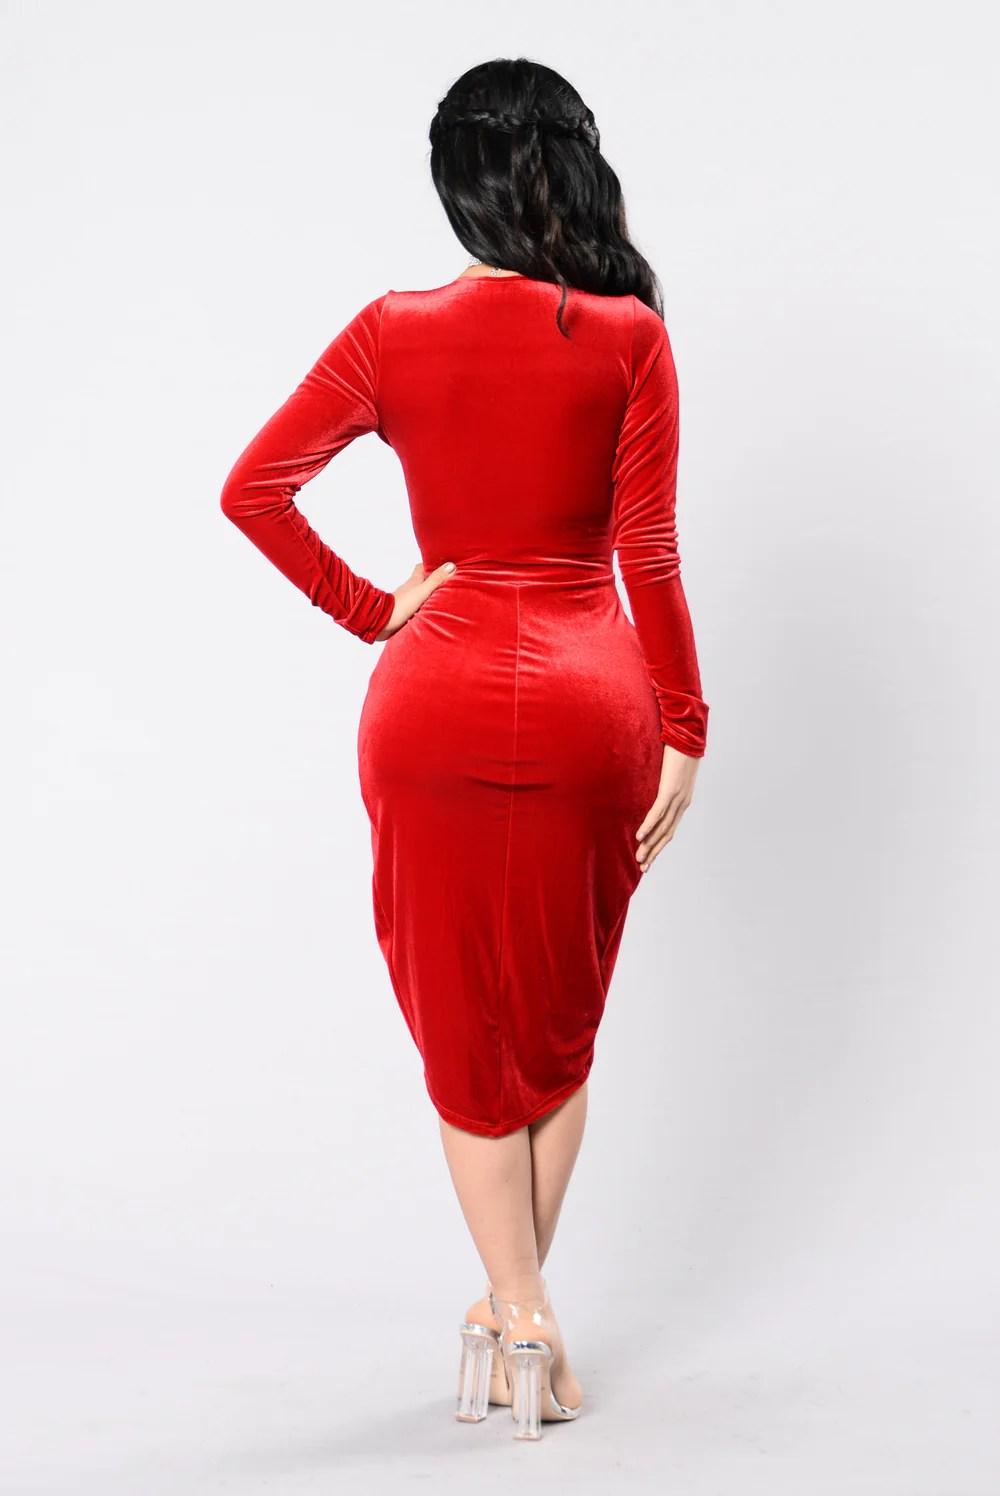 Dance Dress - Red